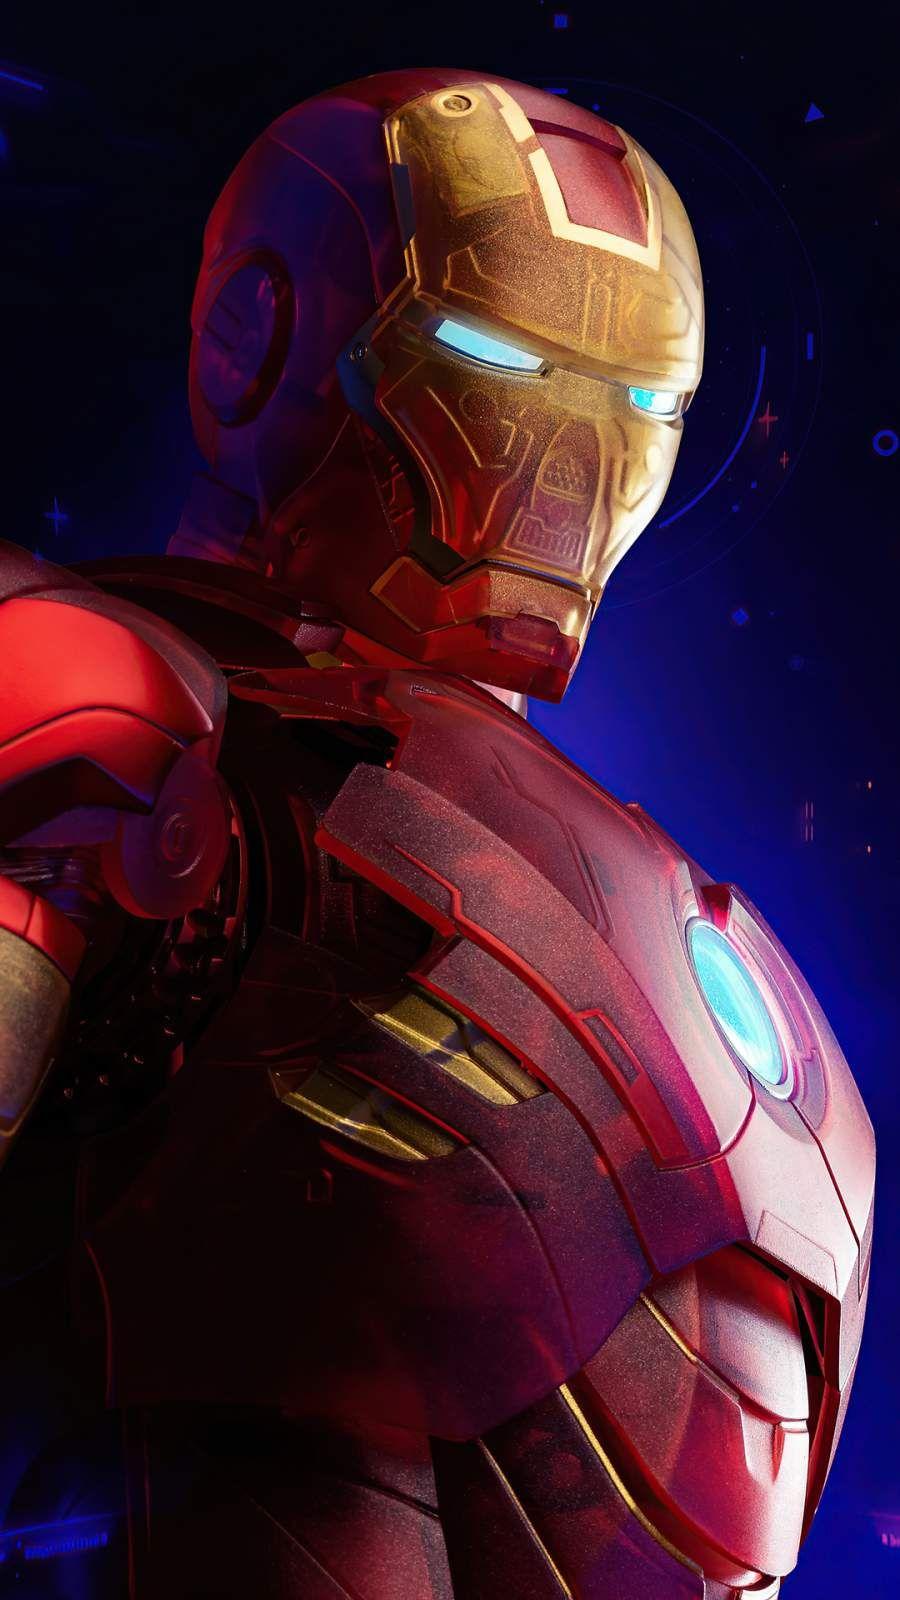 Iron Man Armour In Dark Iphone Wallpaper Iphone Wallpapers Iphone Wallpapers Iron Man Iron Man Fan Art Iron Man Wallpaper Spiderman iron man hologram iphone 11